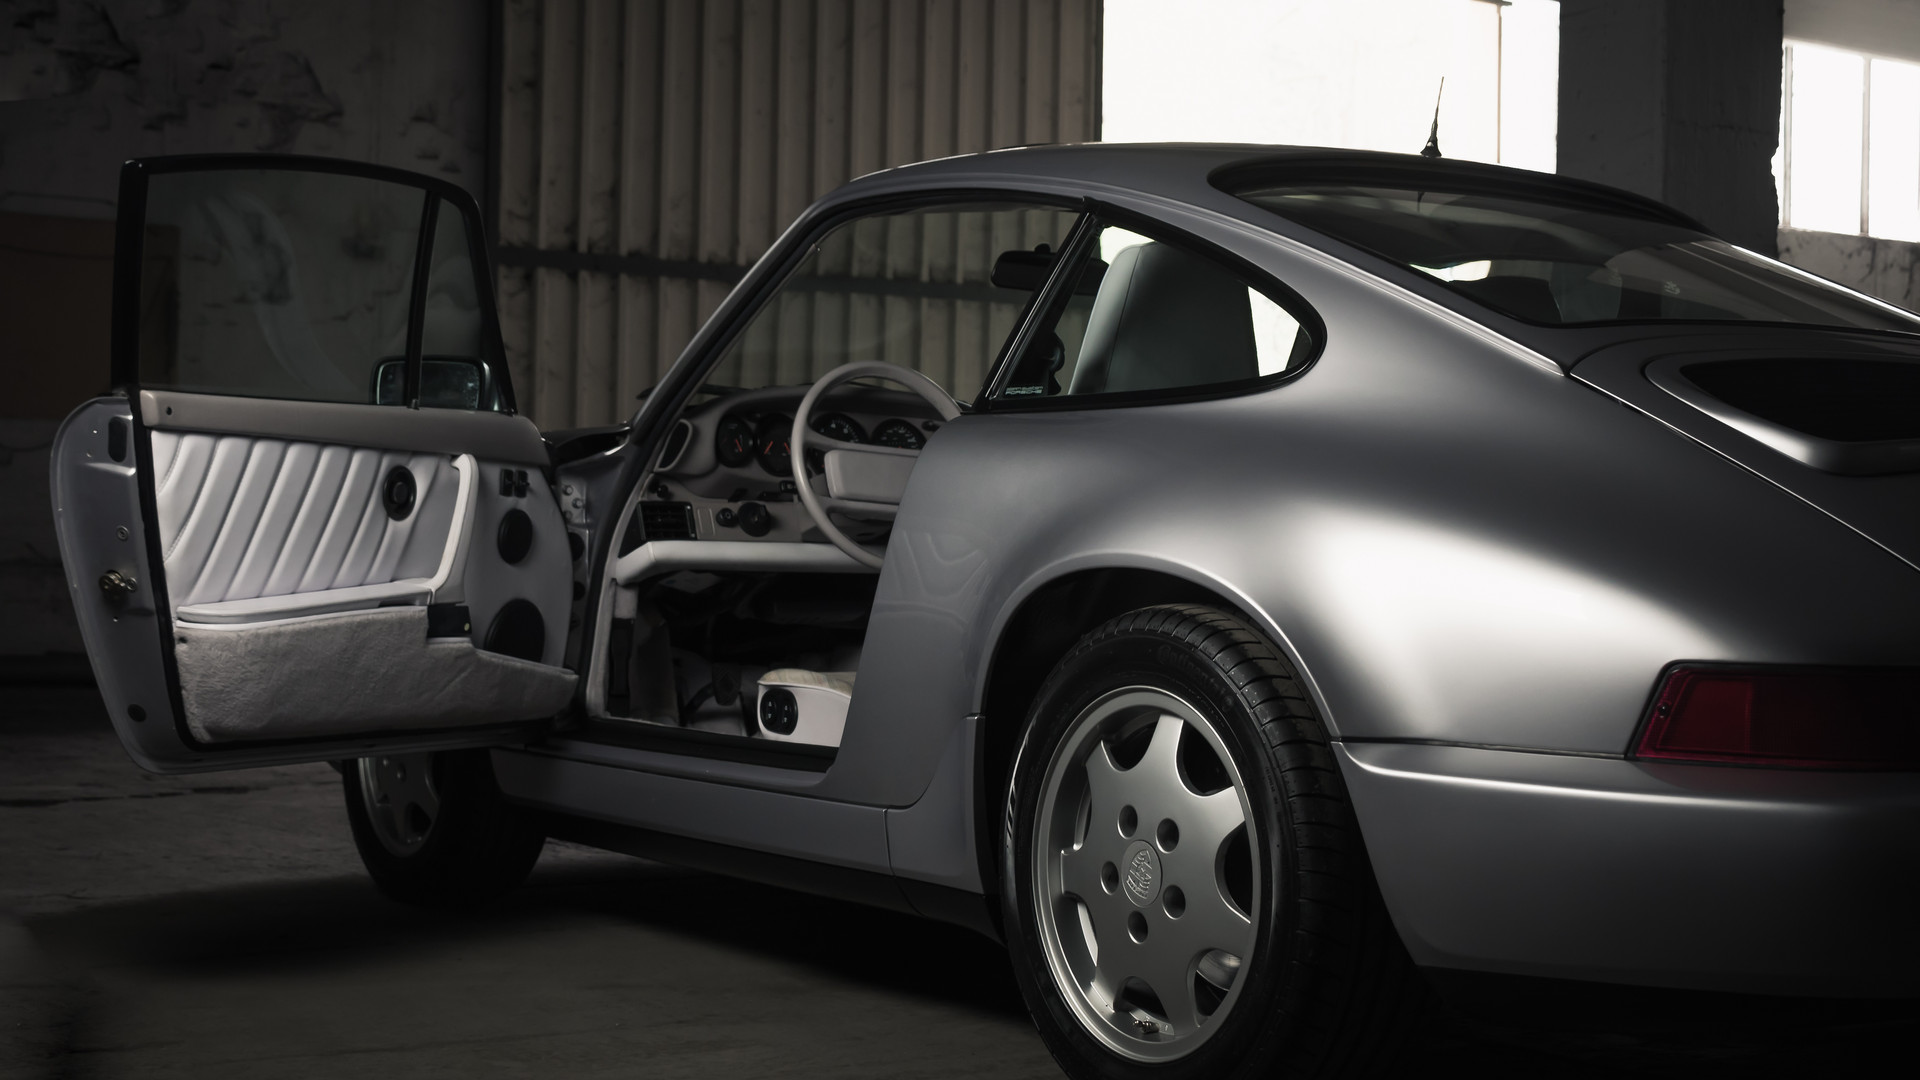 Porsche 964, Carerra 4, 1989